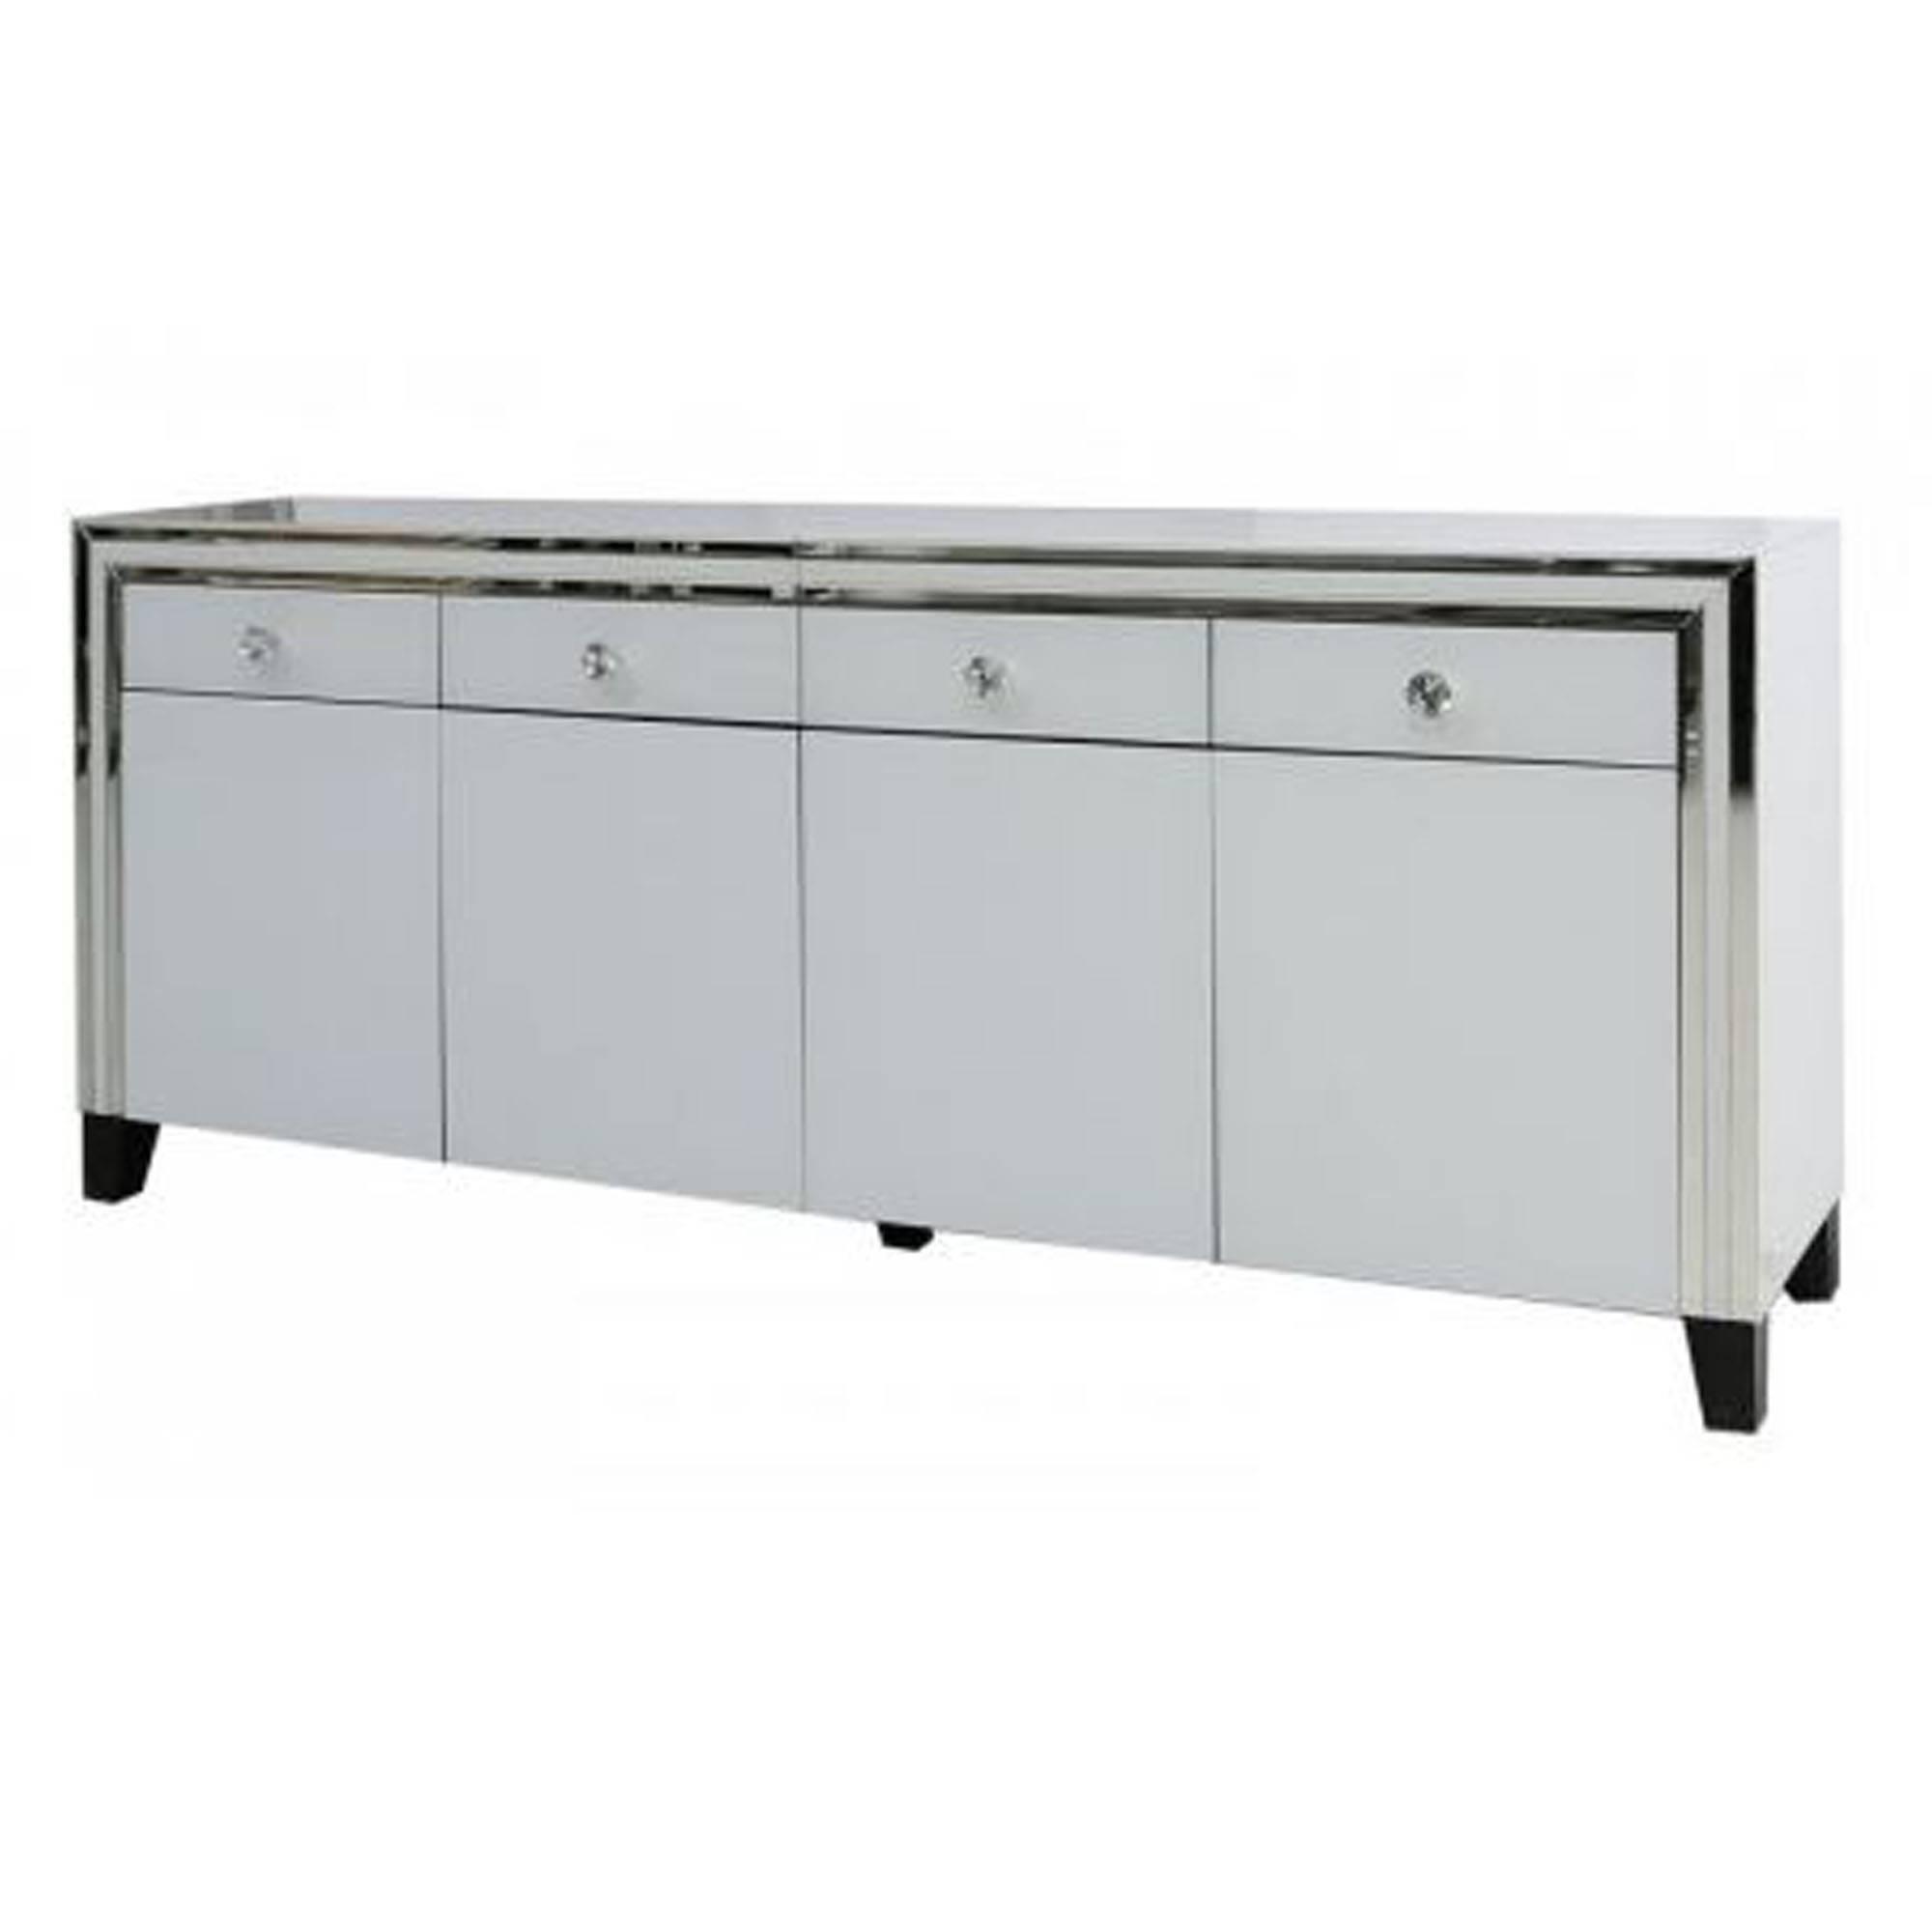 Savona White Mirrored Sideboard | Sideboard | Homesdirect365 Within White Mirrored Sideboards (#8 of 15)